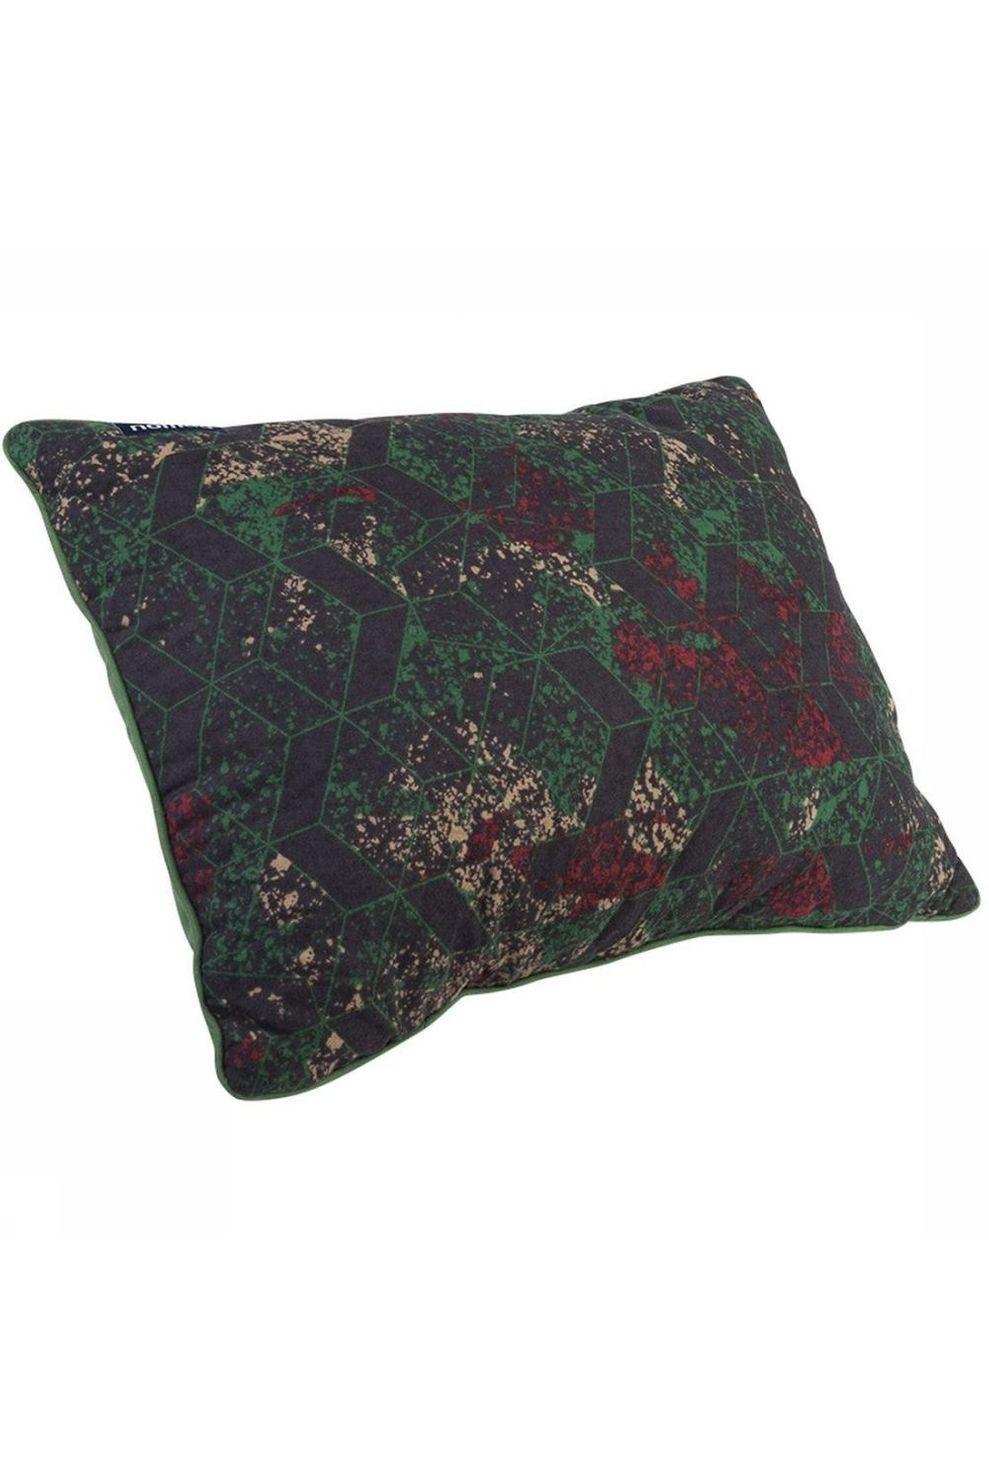 Nomad Kussen Travel Pillow - Groen/ Gemengd